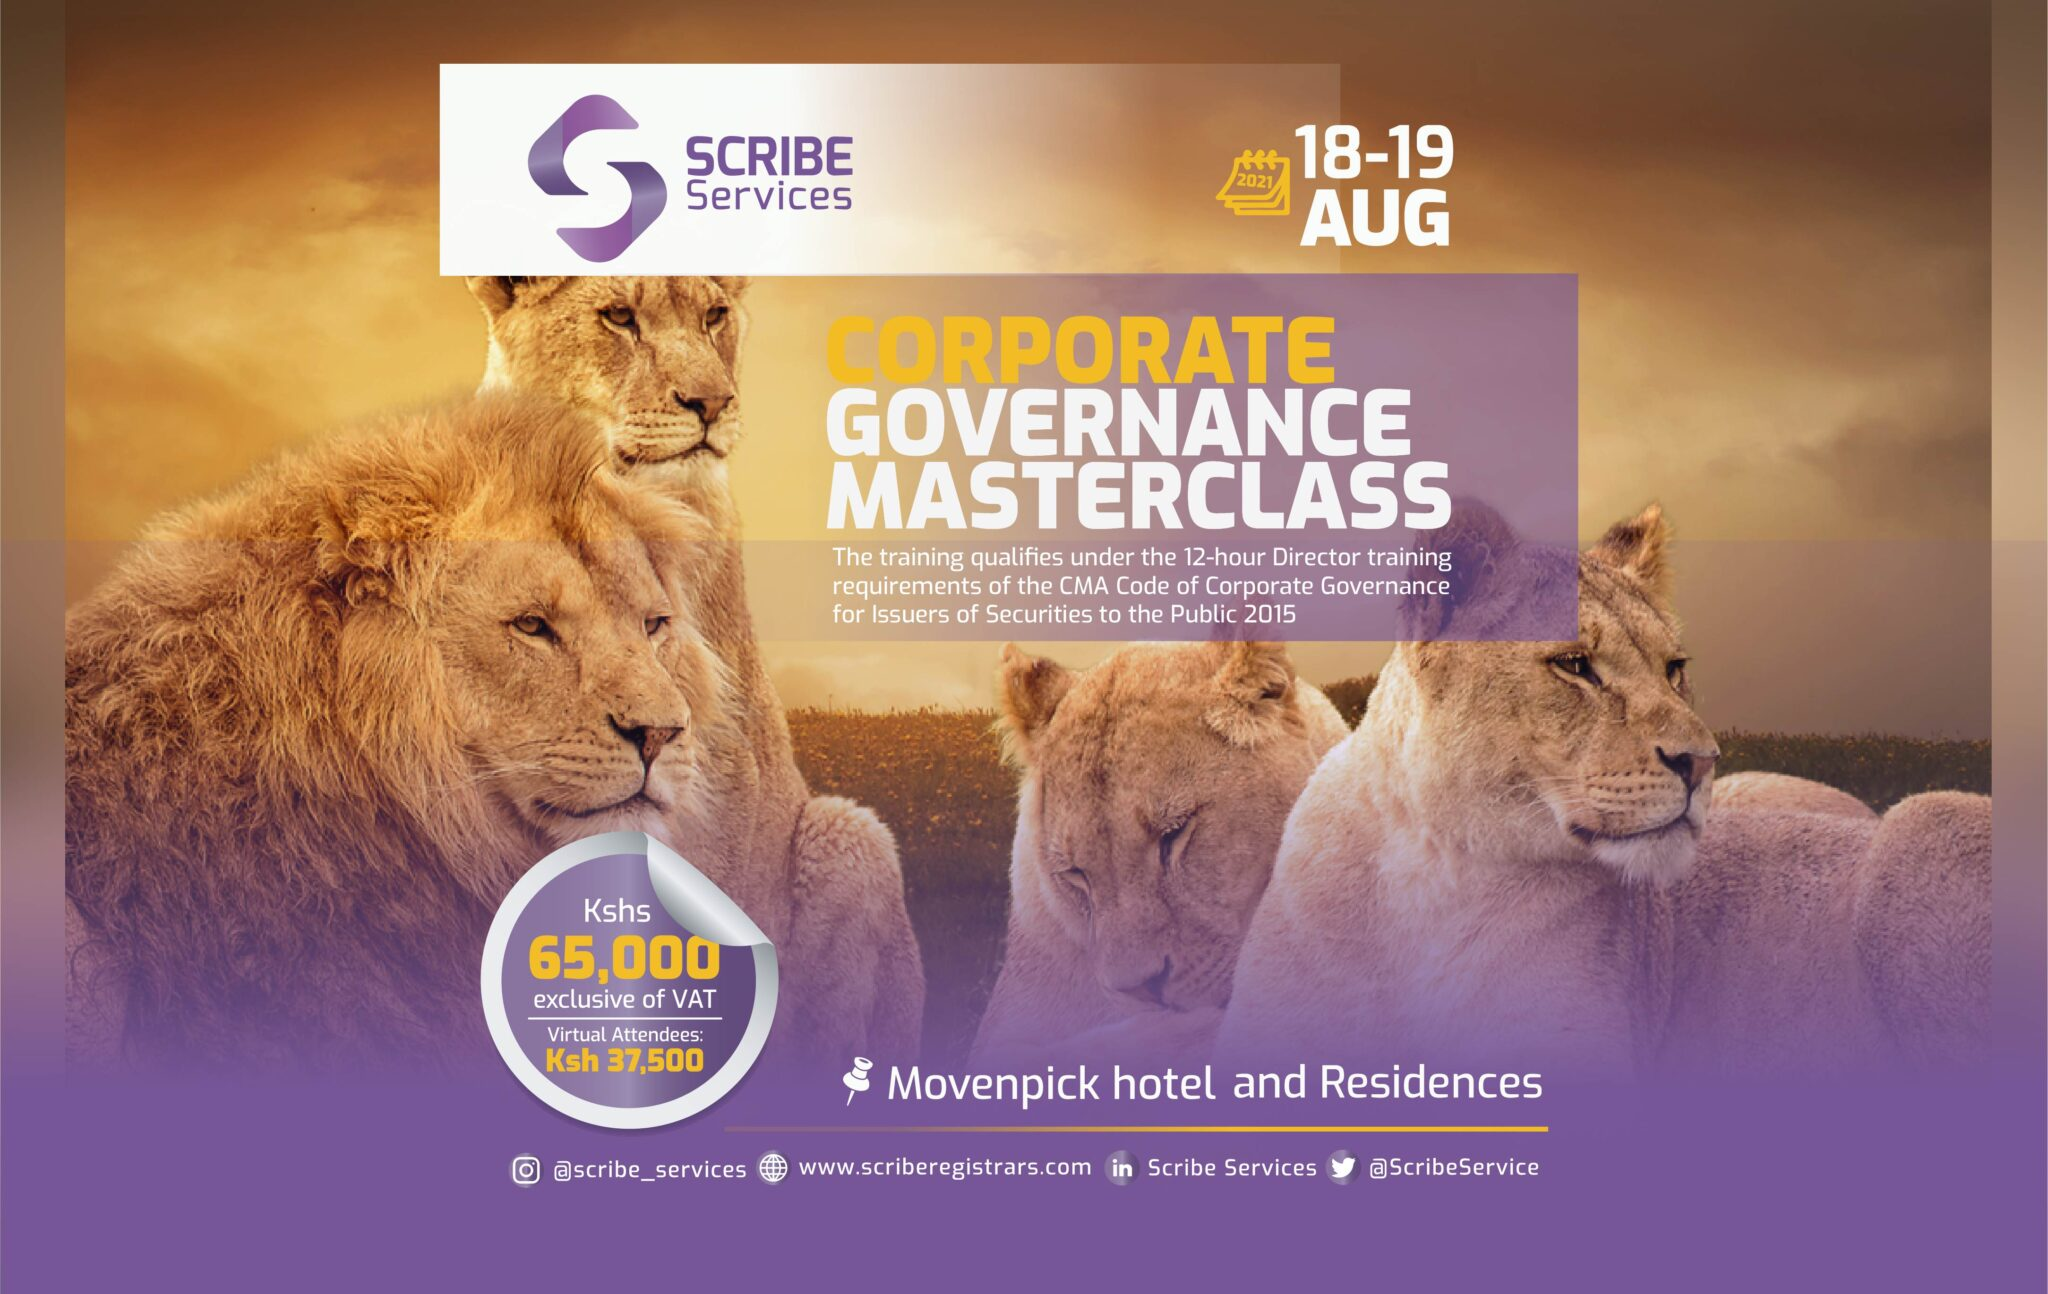 Corporate Governance Training